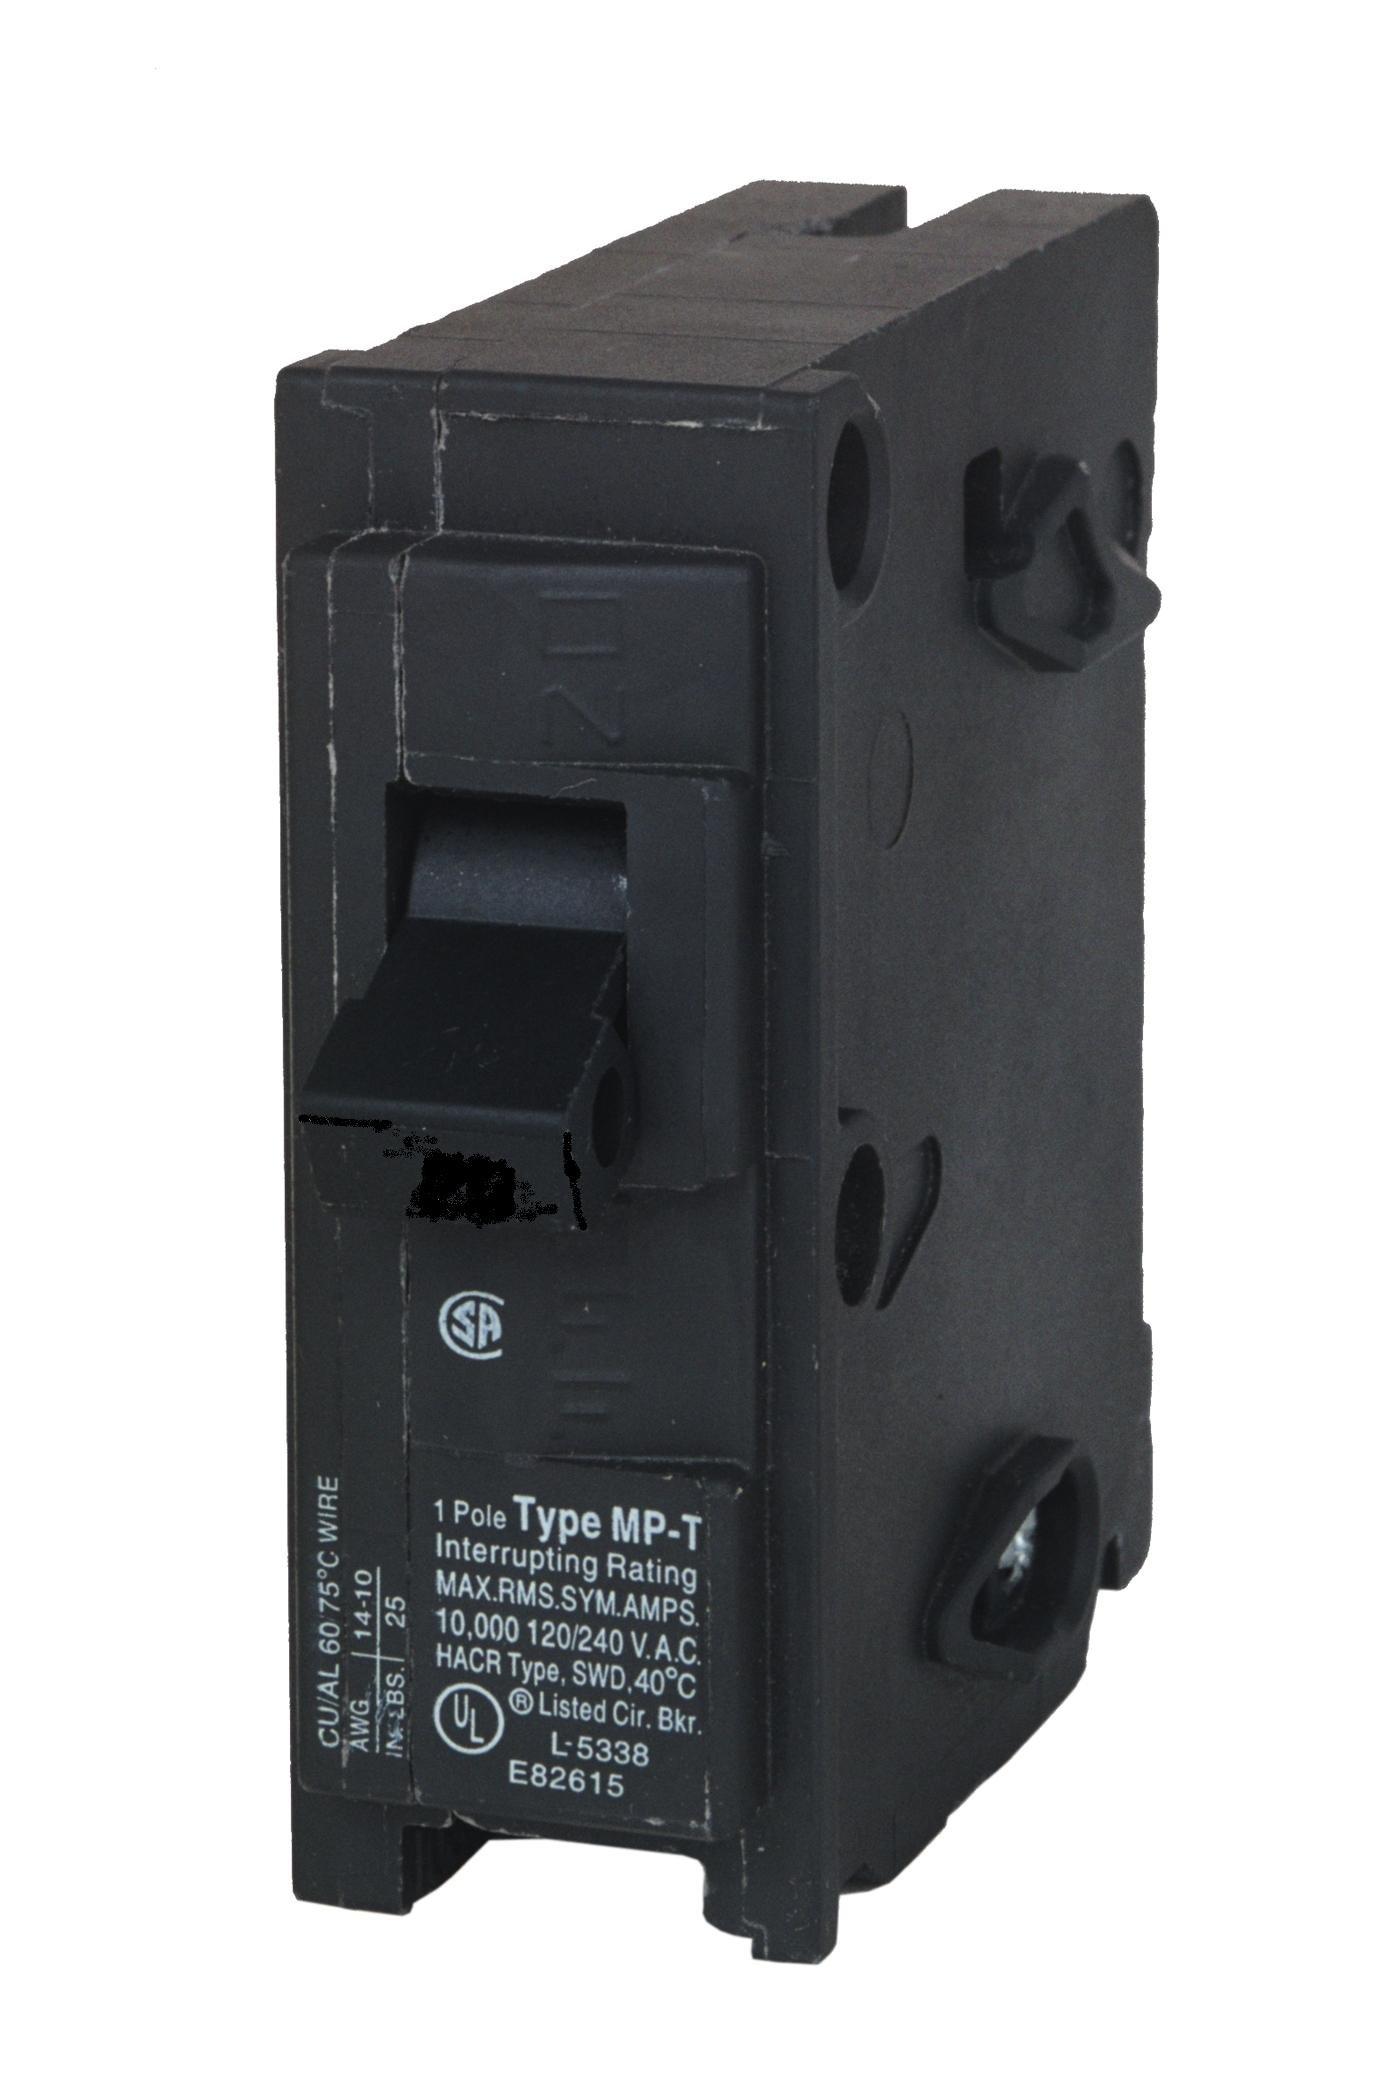 MP150 50-Amp Single Pole Type MP-T Circuit Breaker